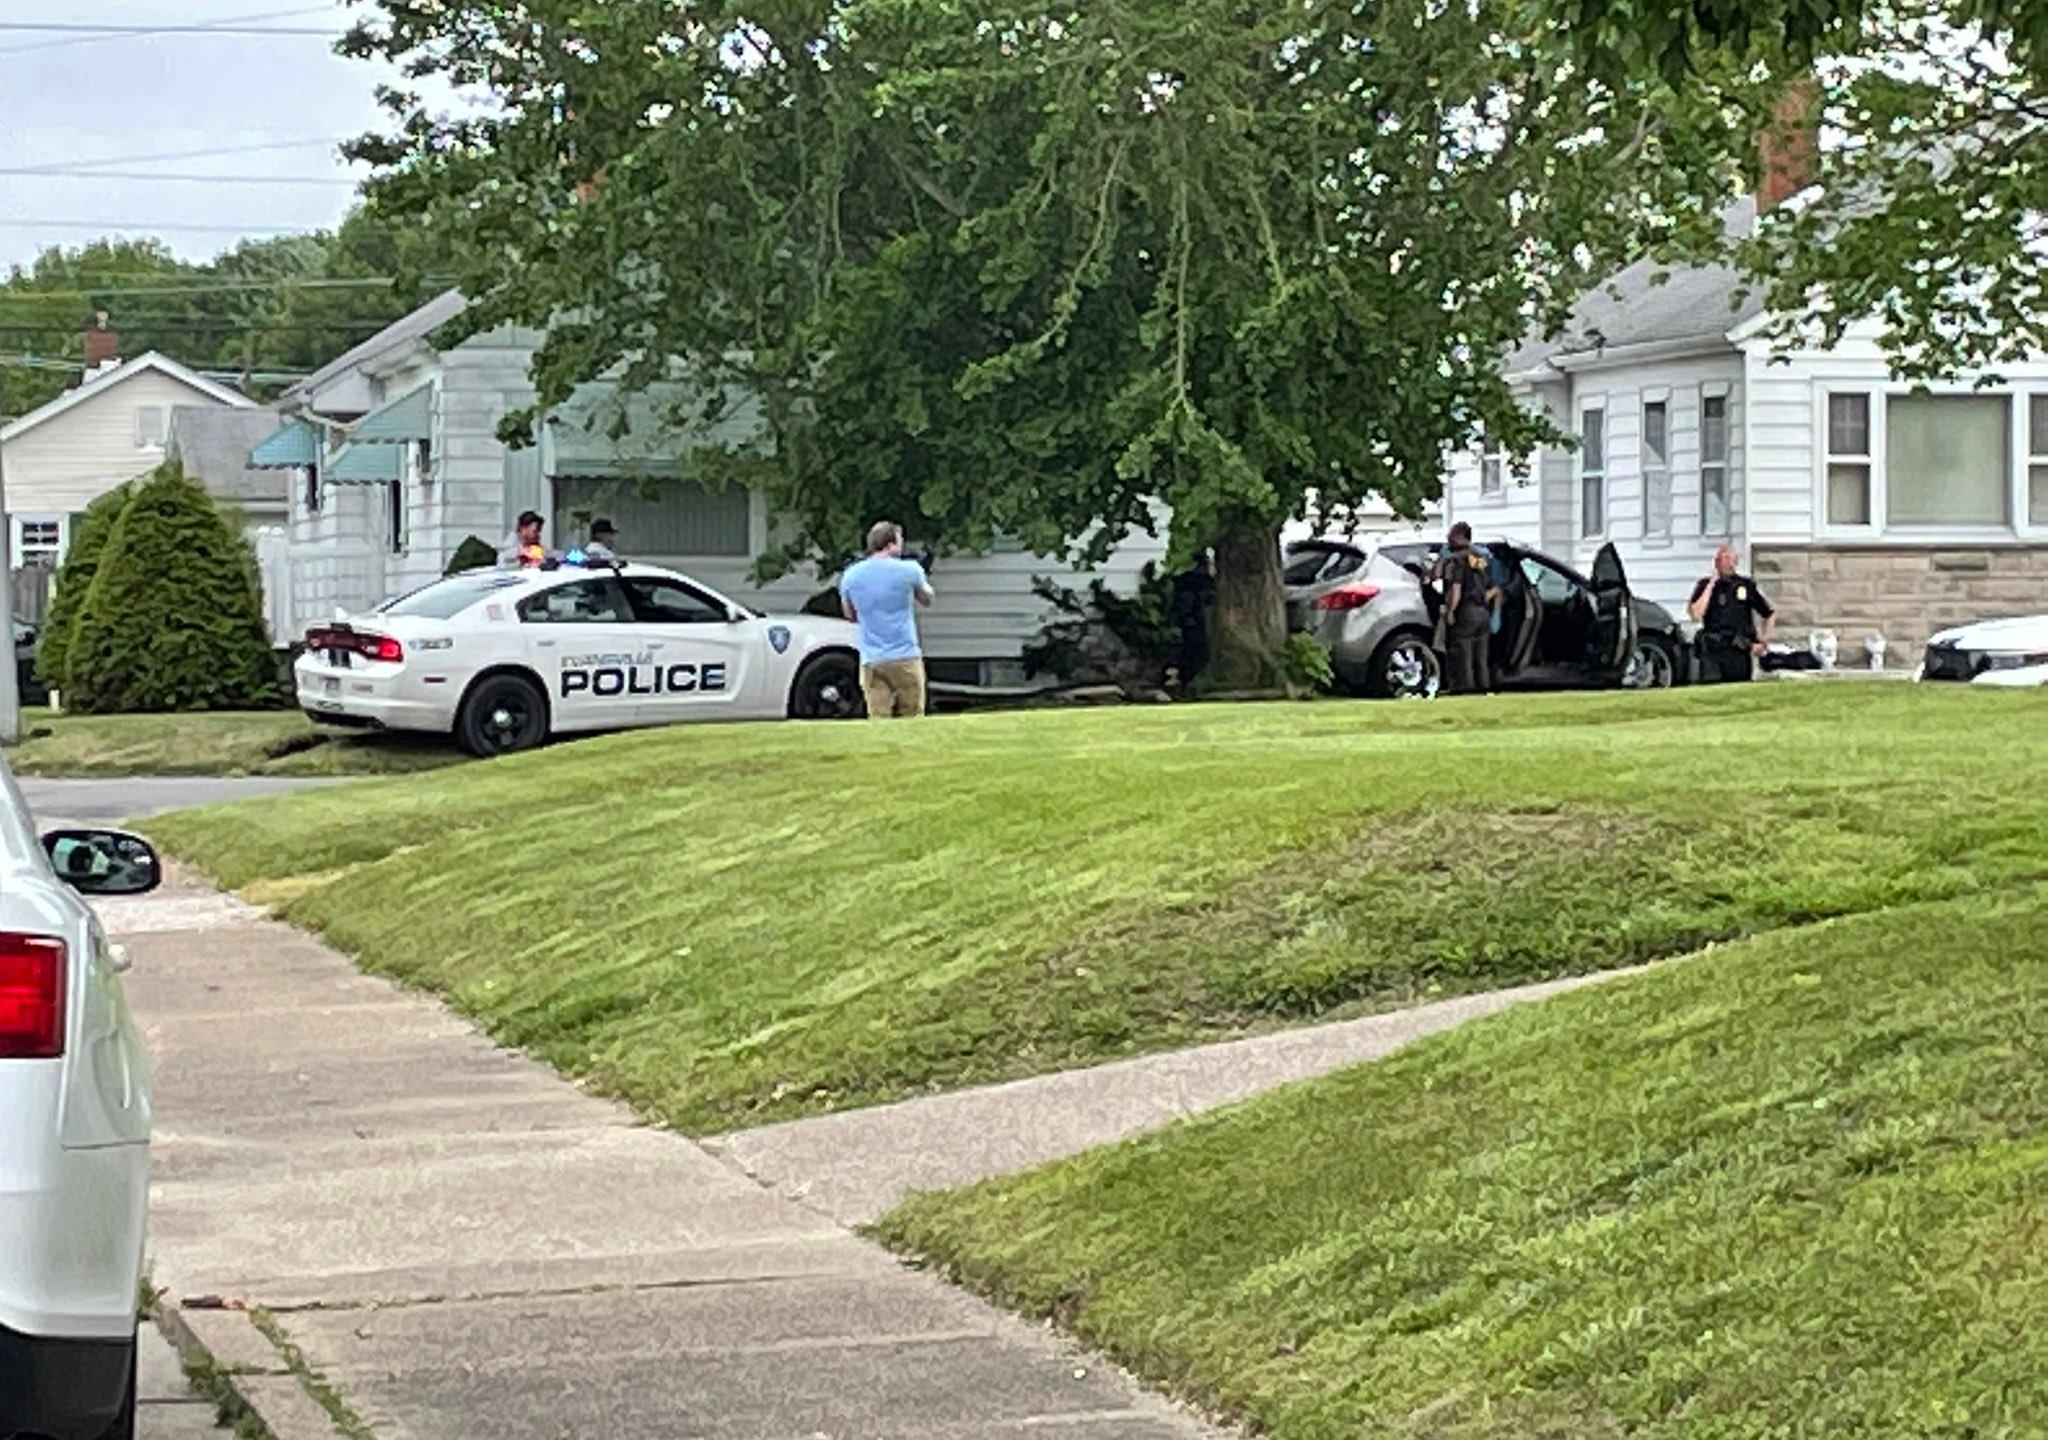 Police chase / Crash into house